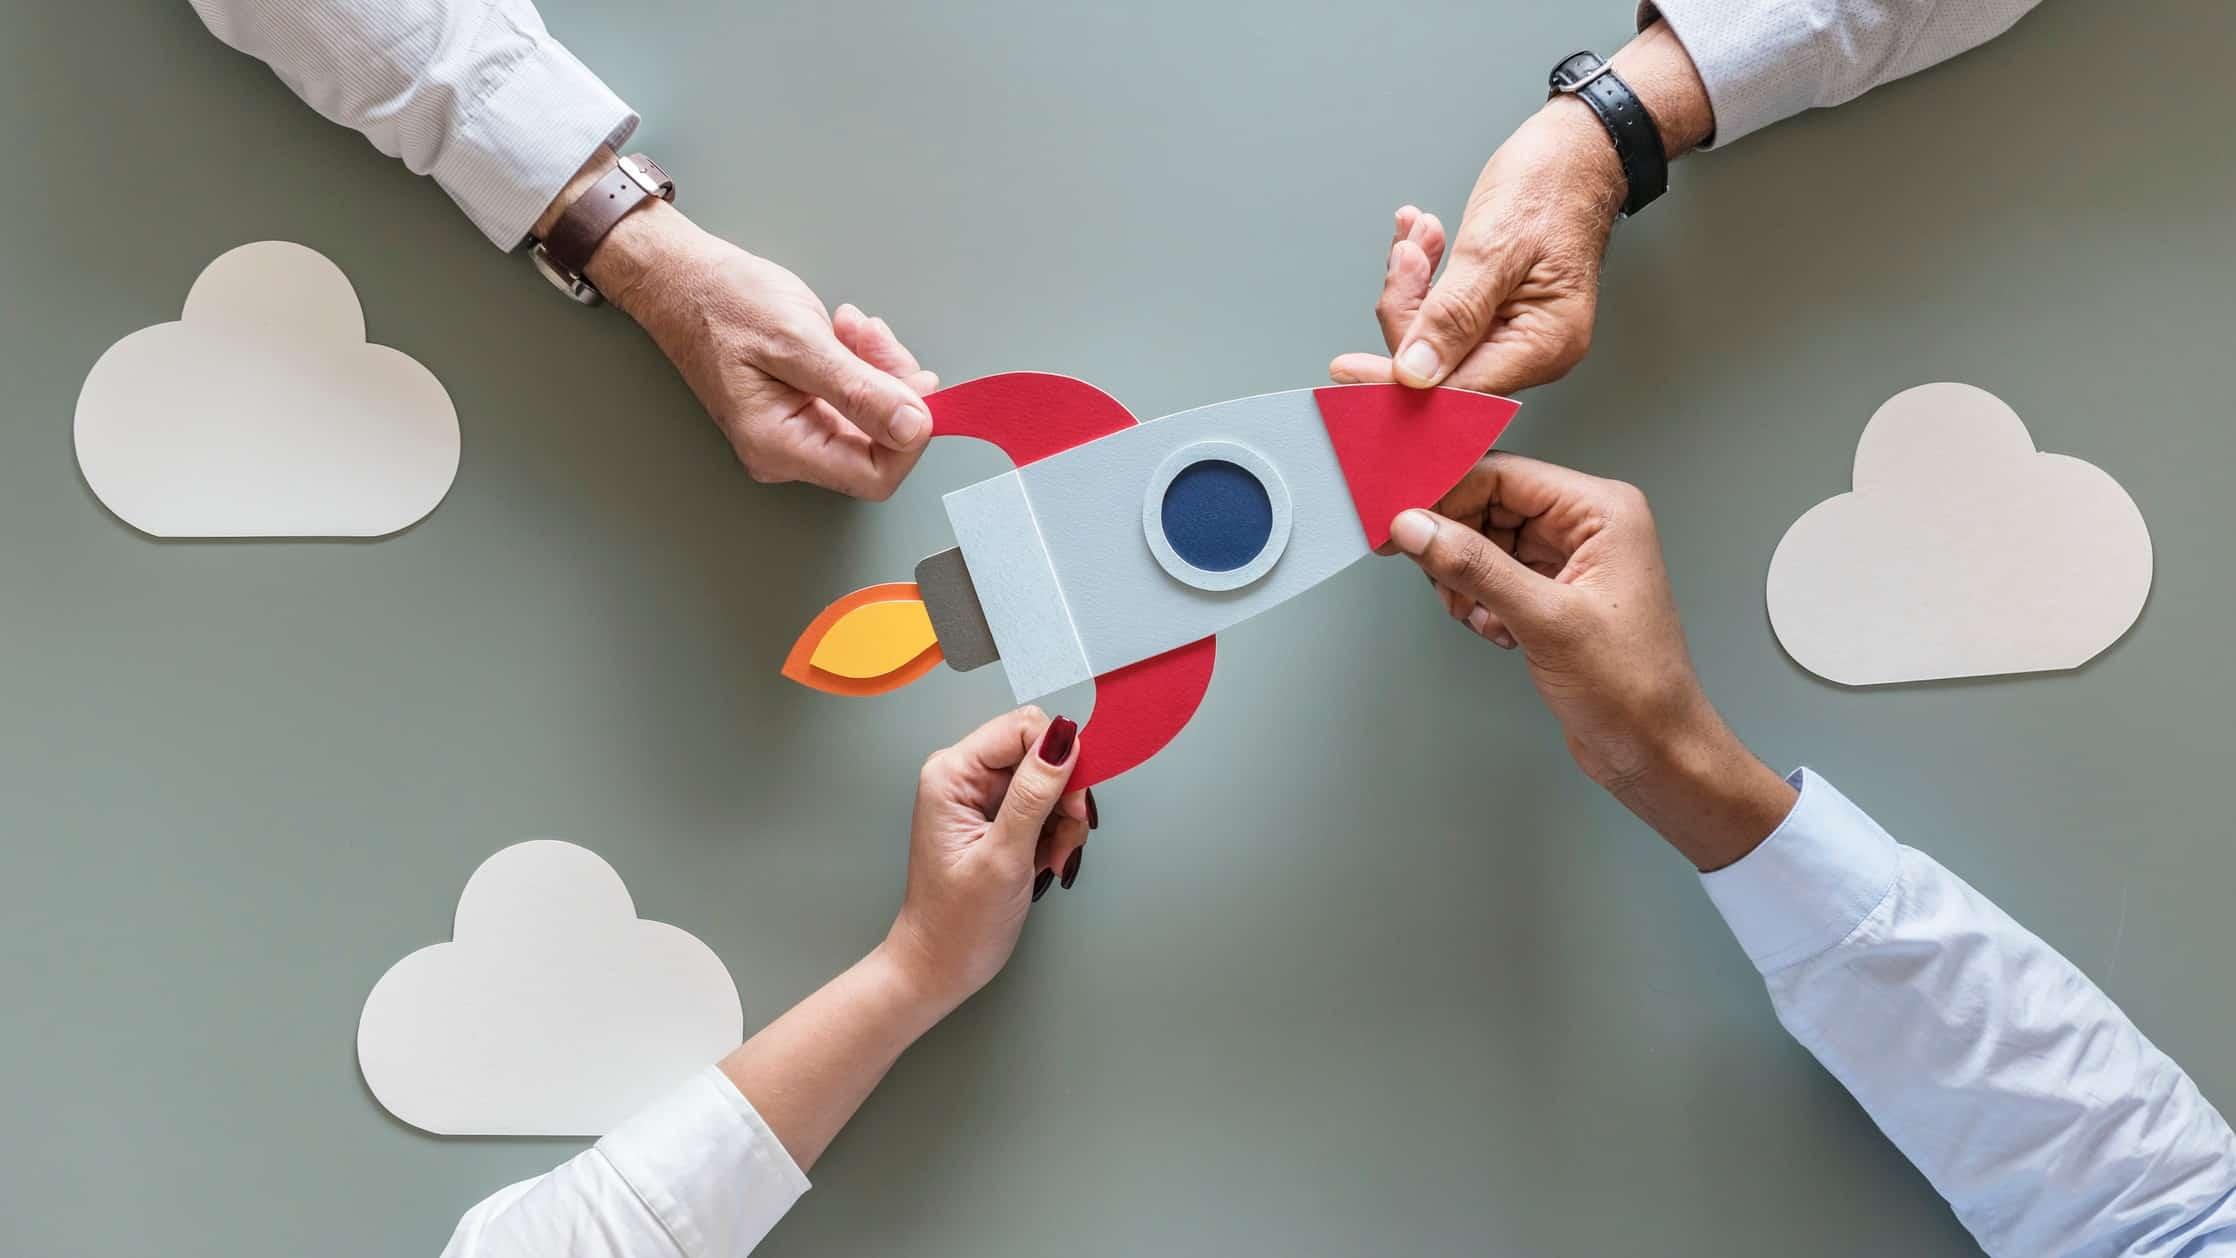 four hand grabbing paper cut out of rocker representing 4 asx tech shares